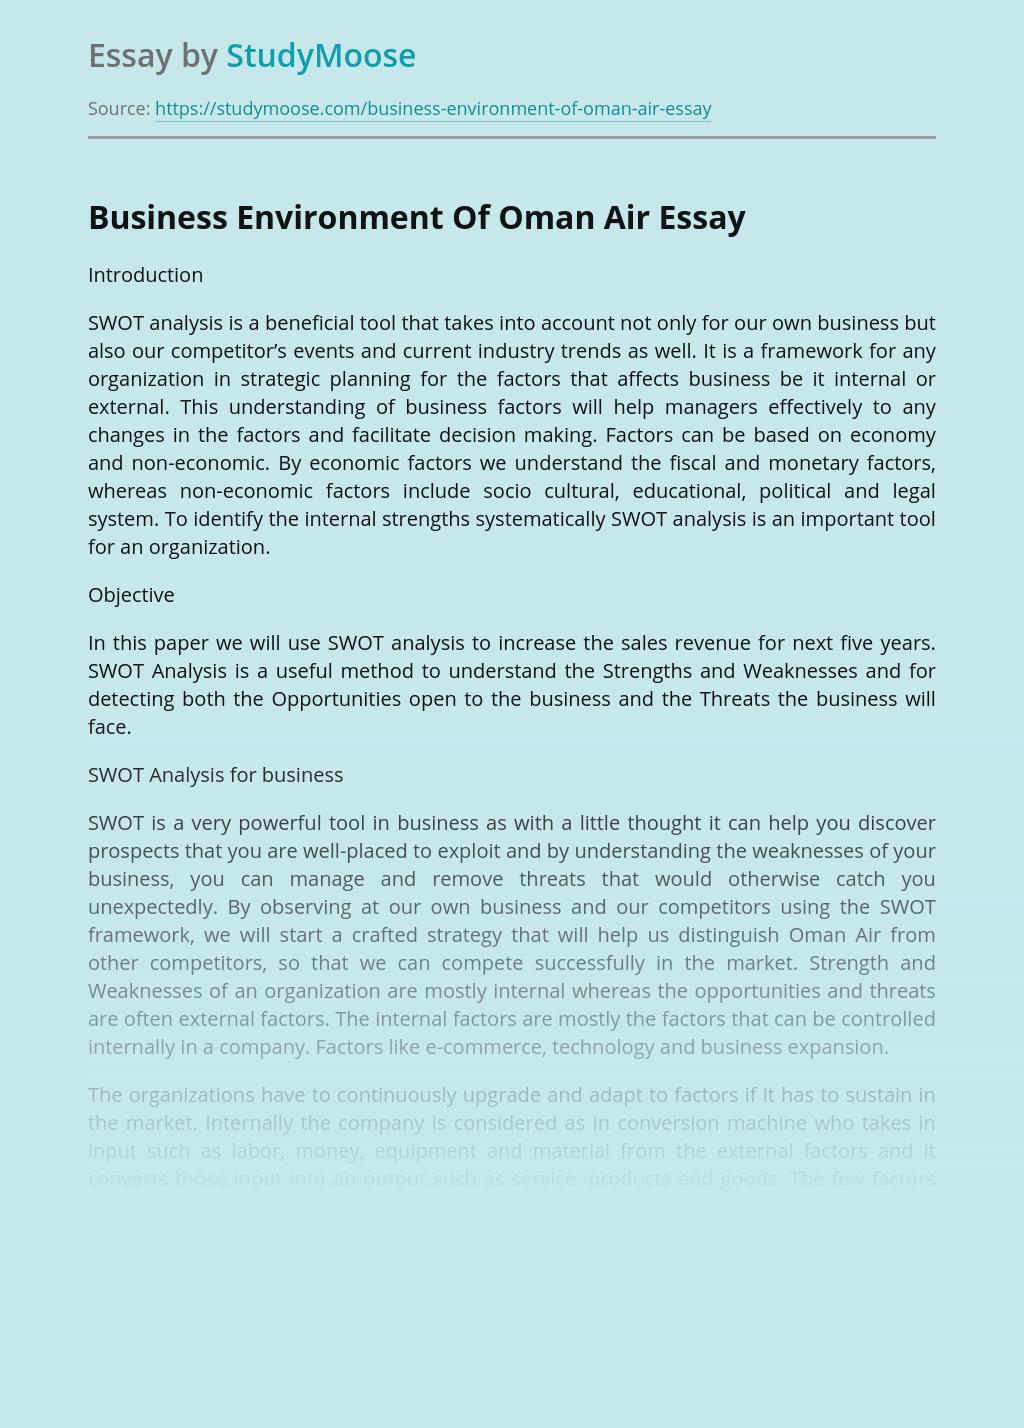 Business Environment Of Oman Air